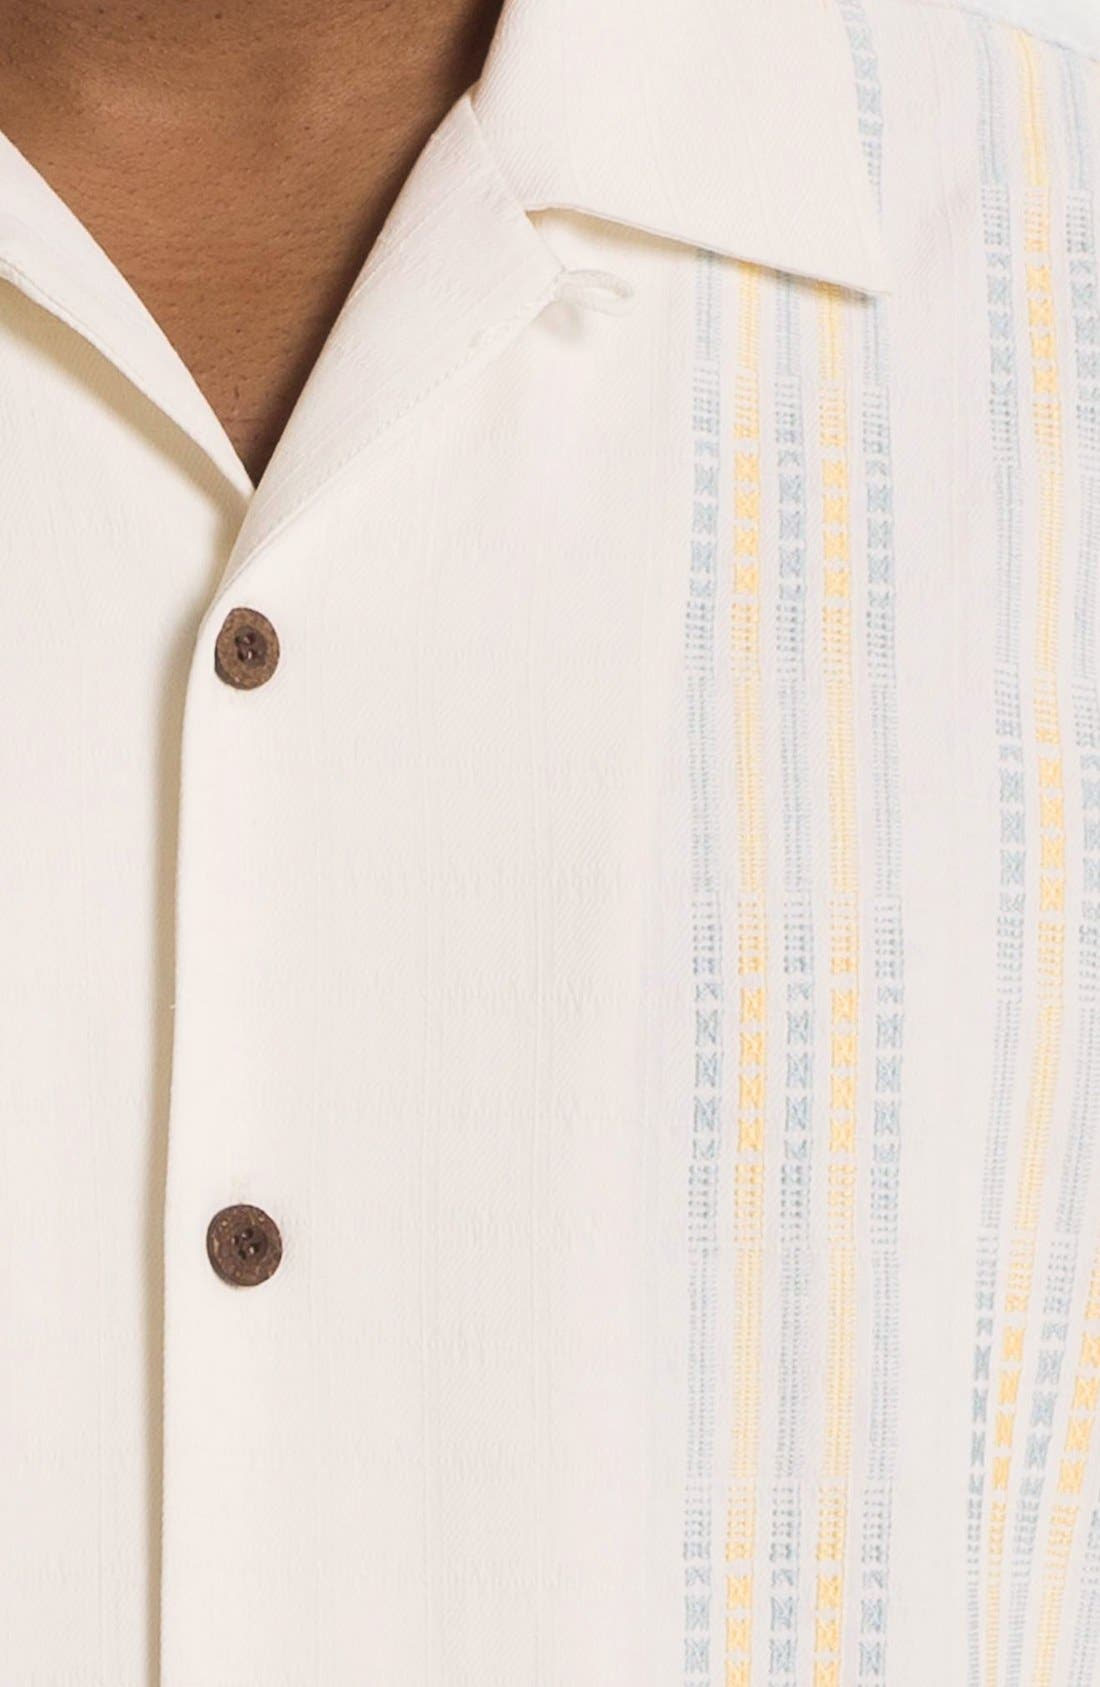 Alternate Image 3  - Tommy Bahama 'Four Amigos' Silk Campshirt (Big & Tall)